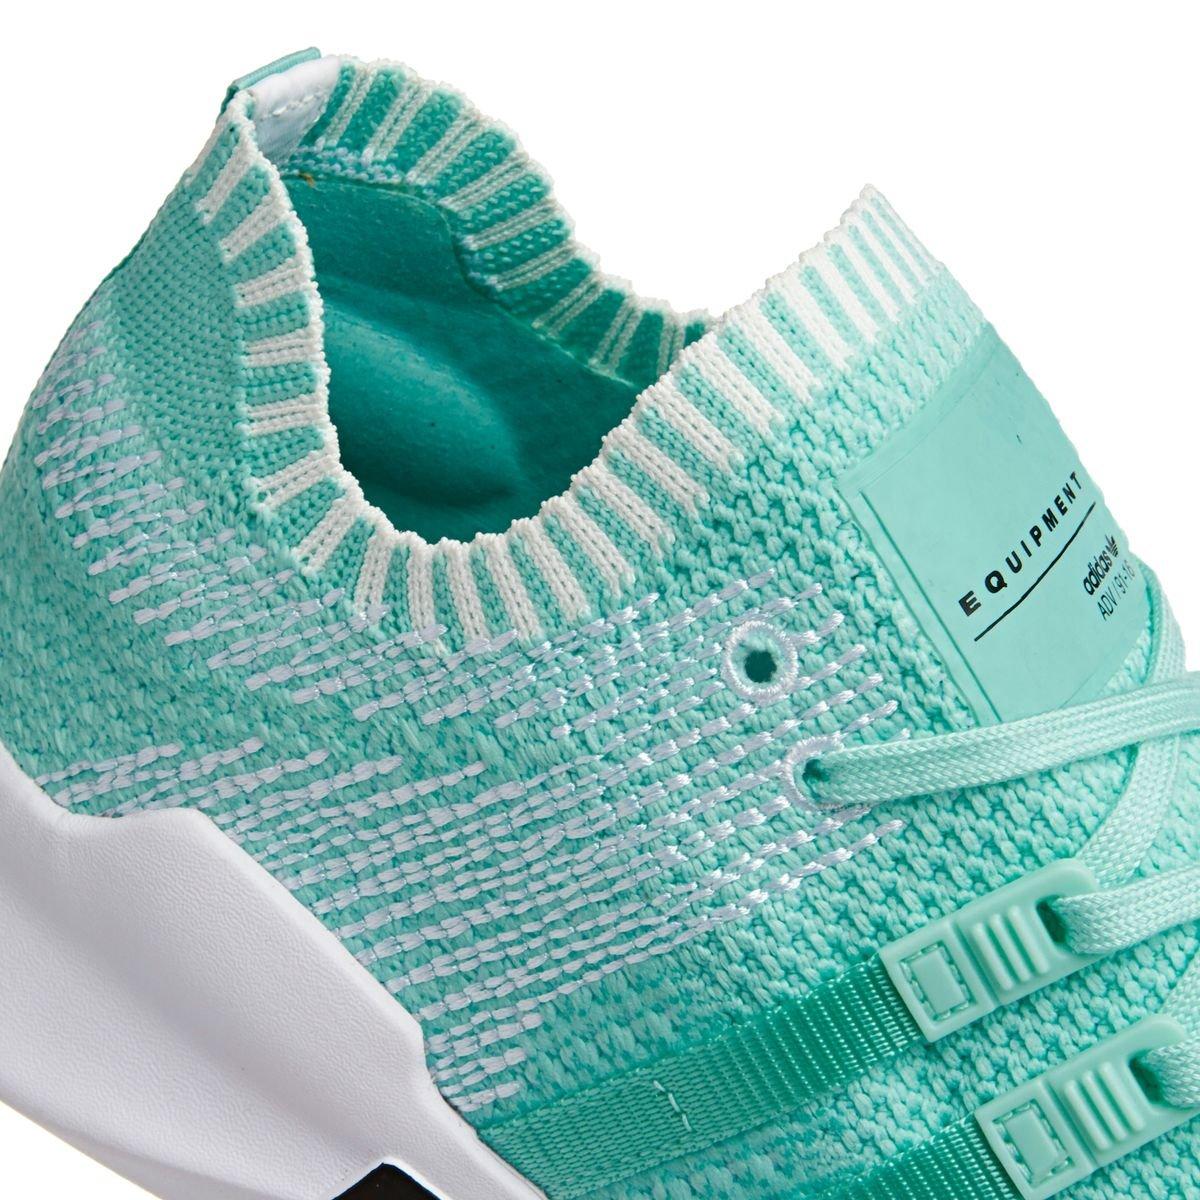 Adidas Damen EQT Support ADV Pk Pk Pk W Fitnessschuhe Teal 49e375